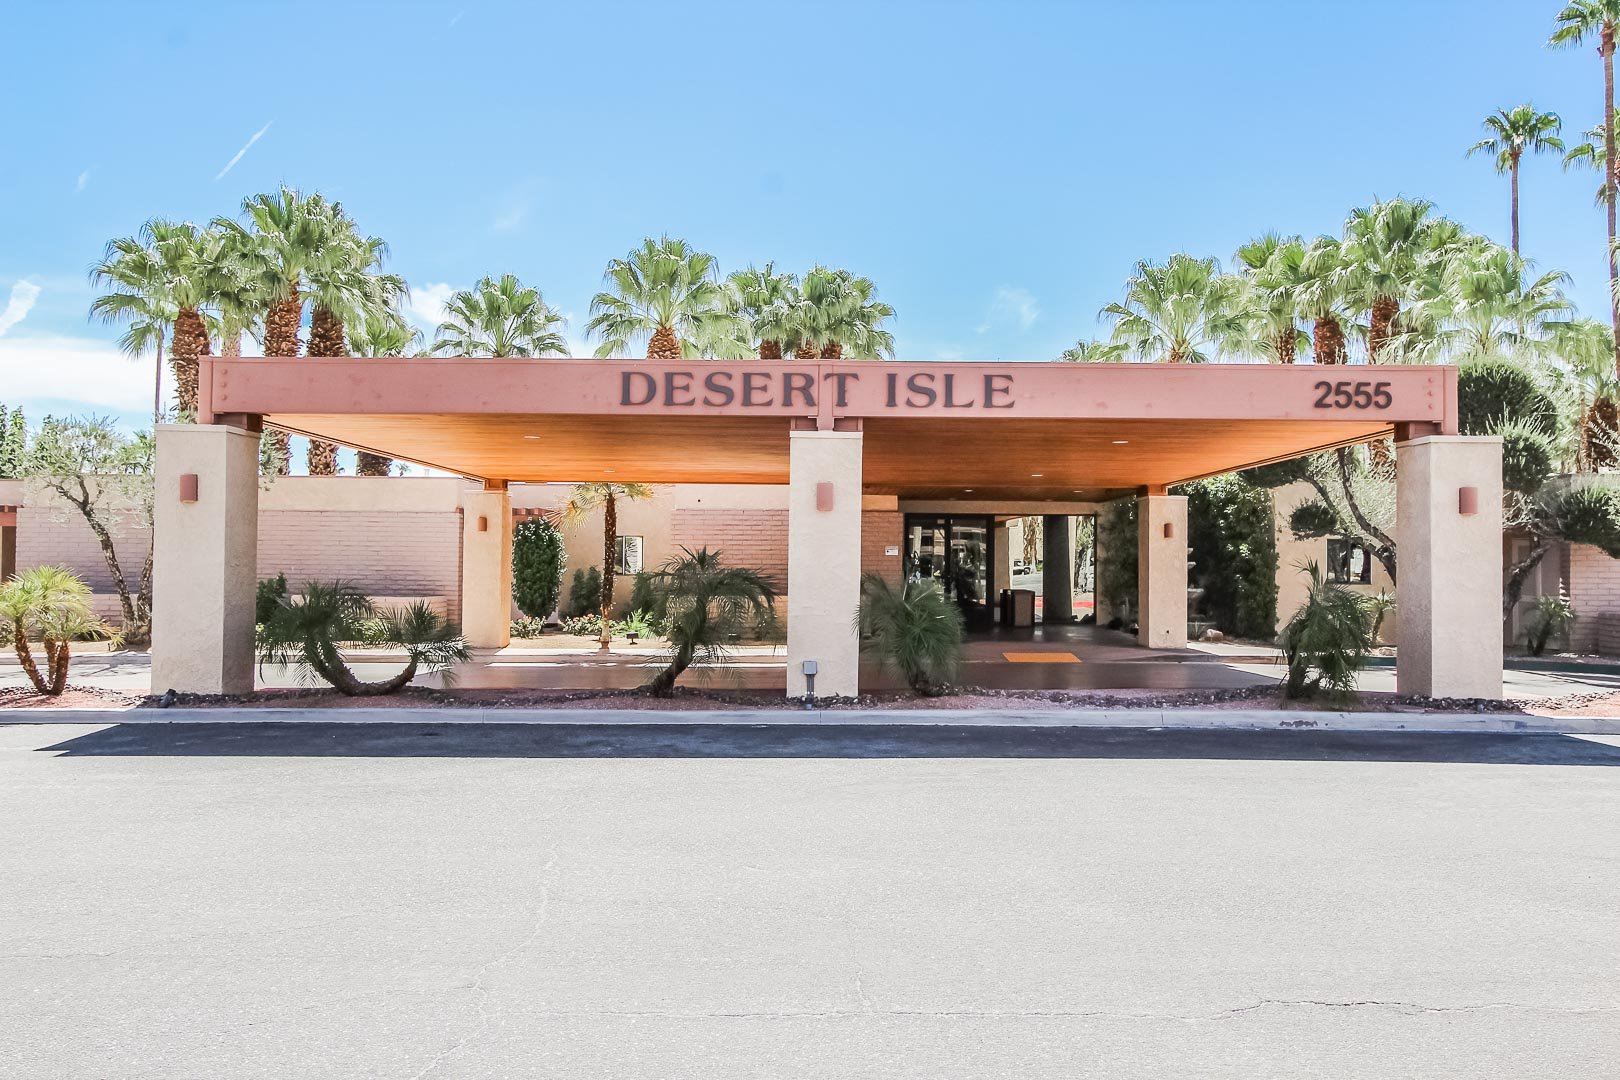 A stoic resort entrance at VRI's Desert Isle Resort in California.